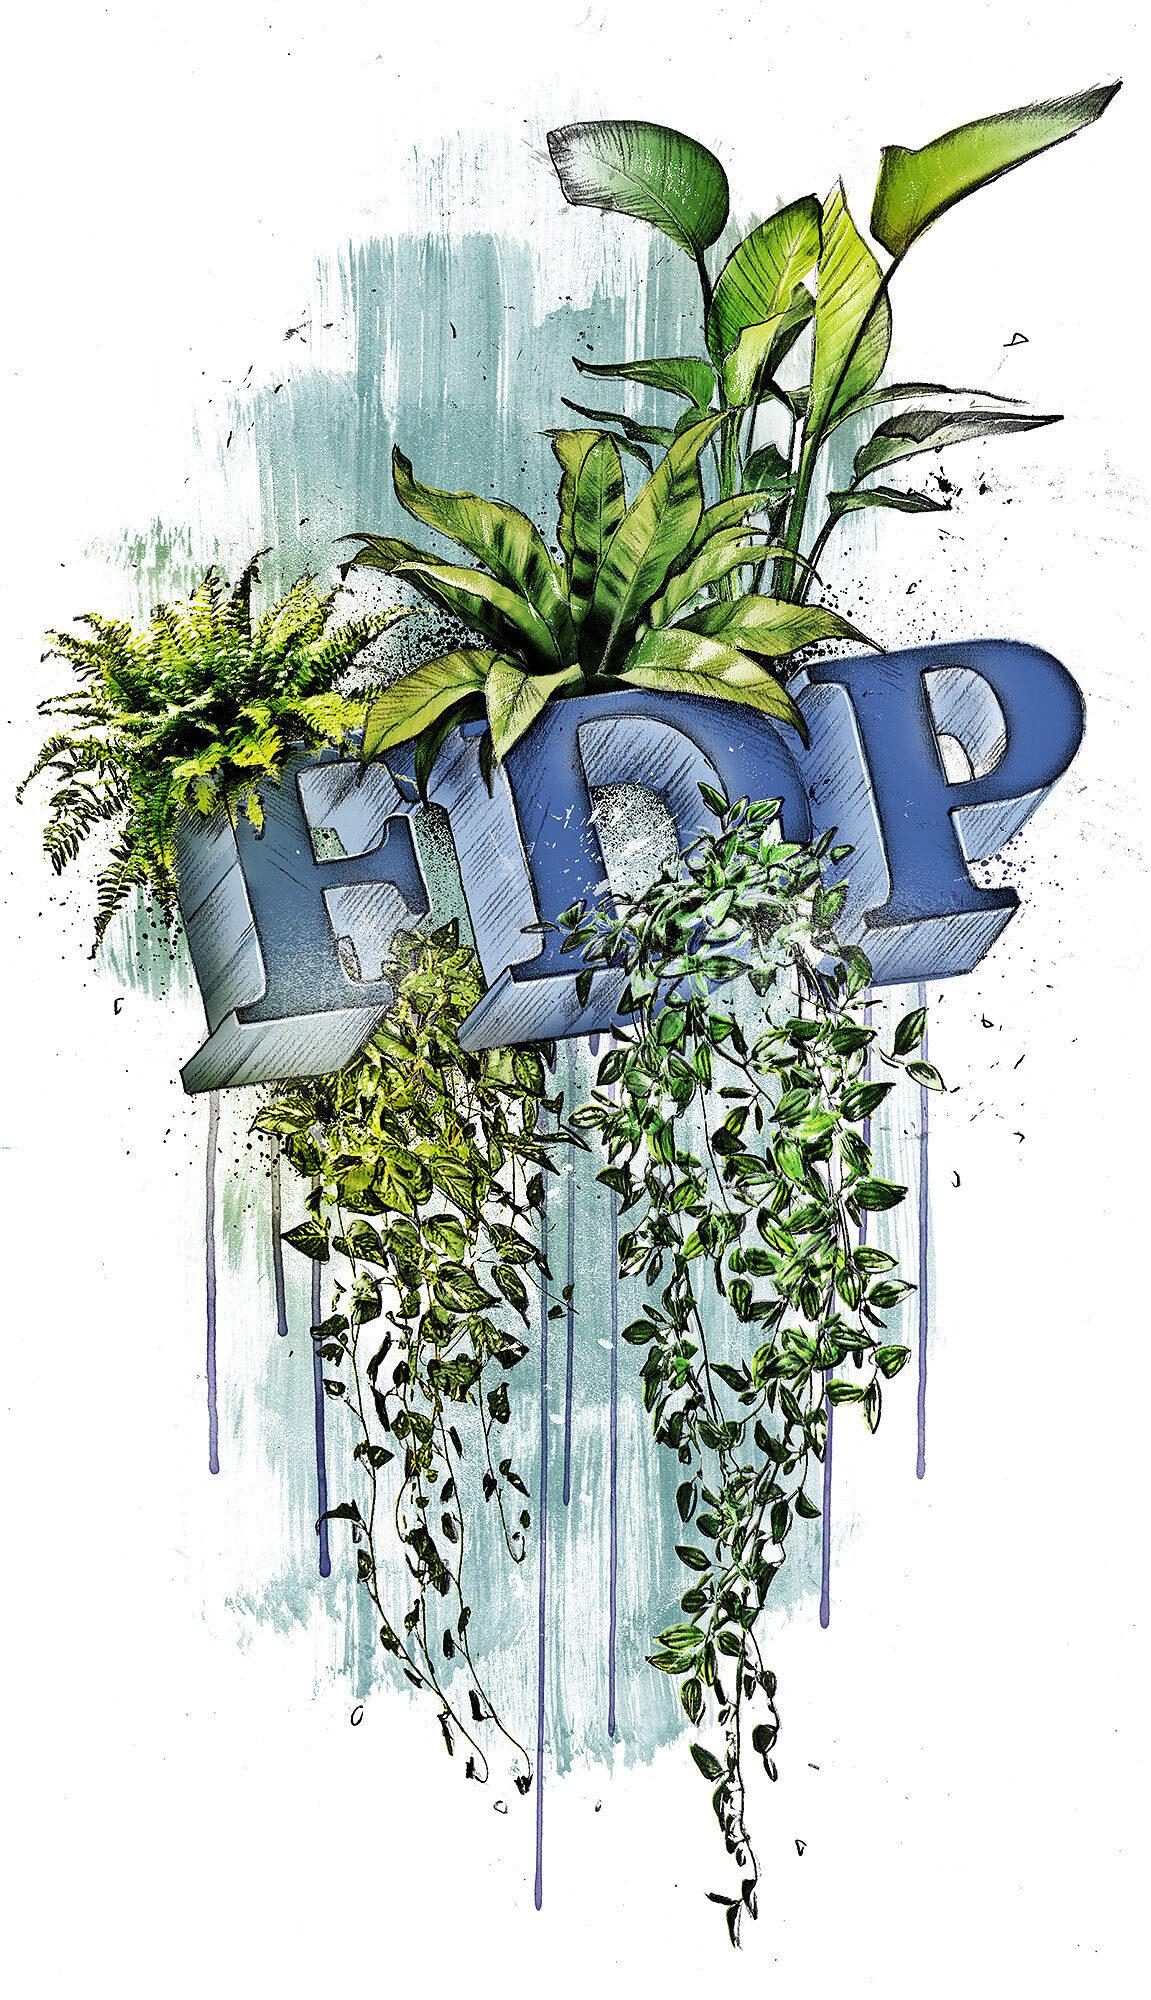 FDP Klima Krise - Kornel Illustration   Kornel Stadler portfolio